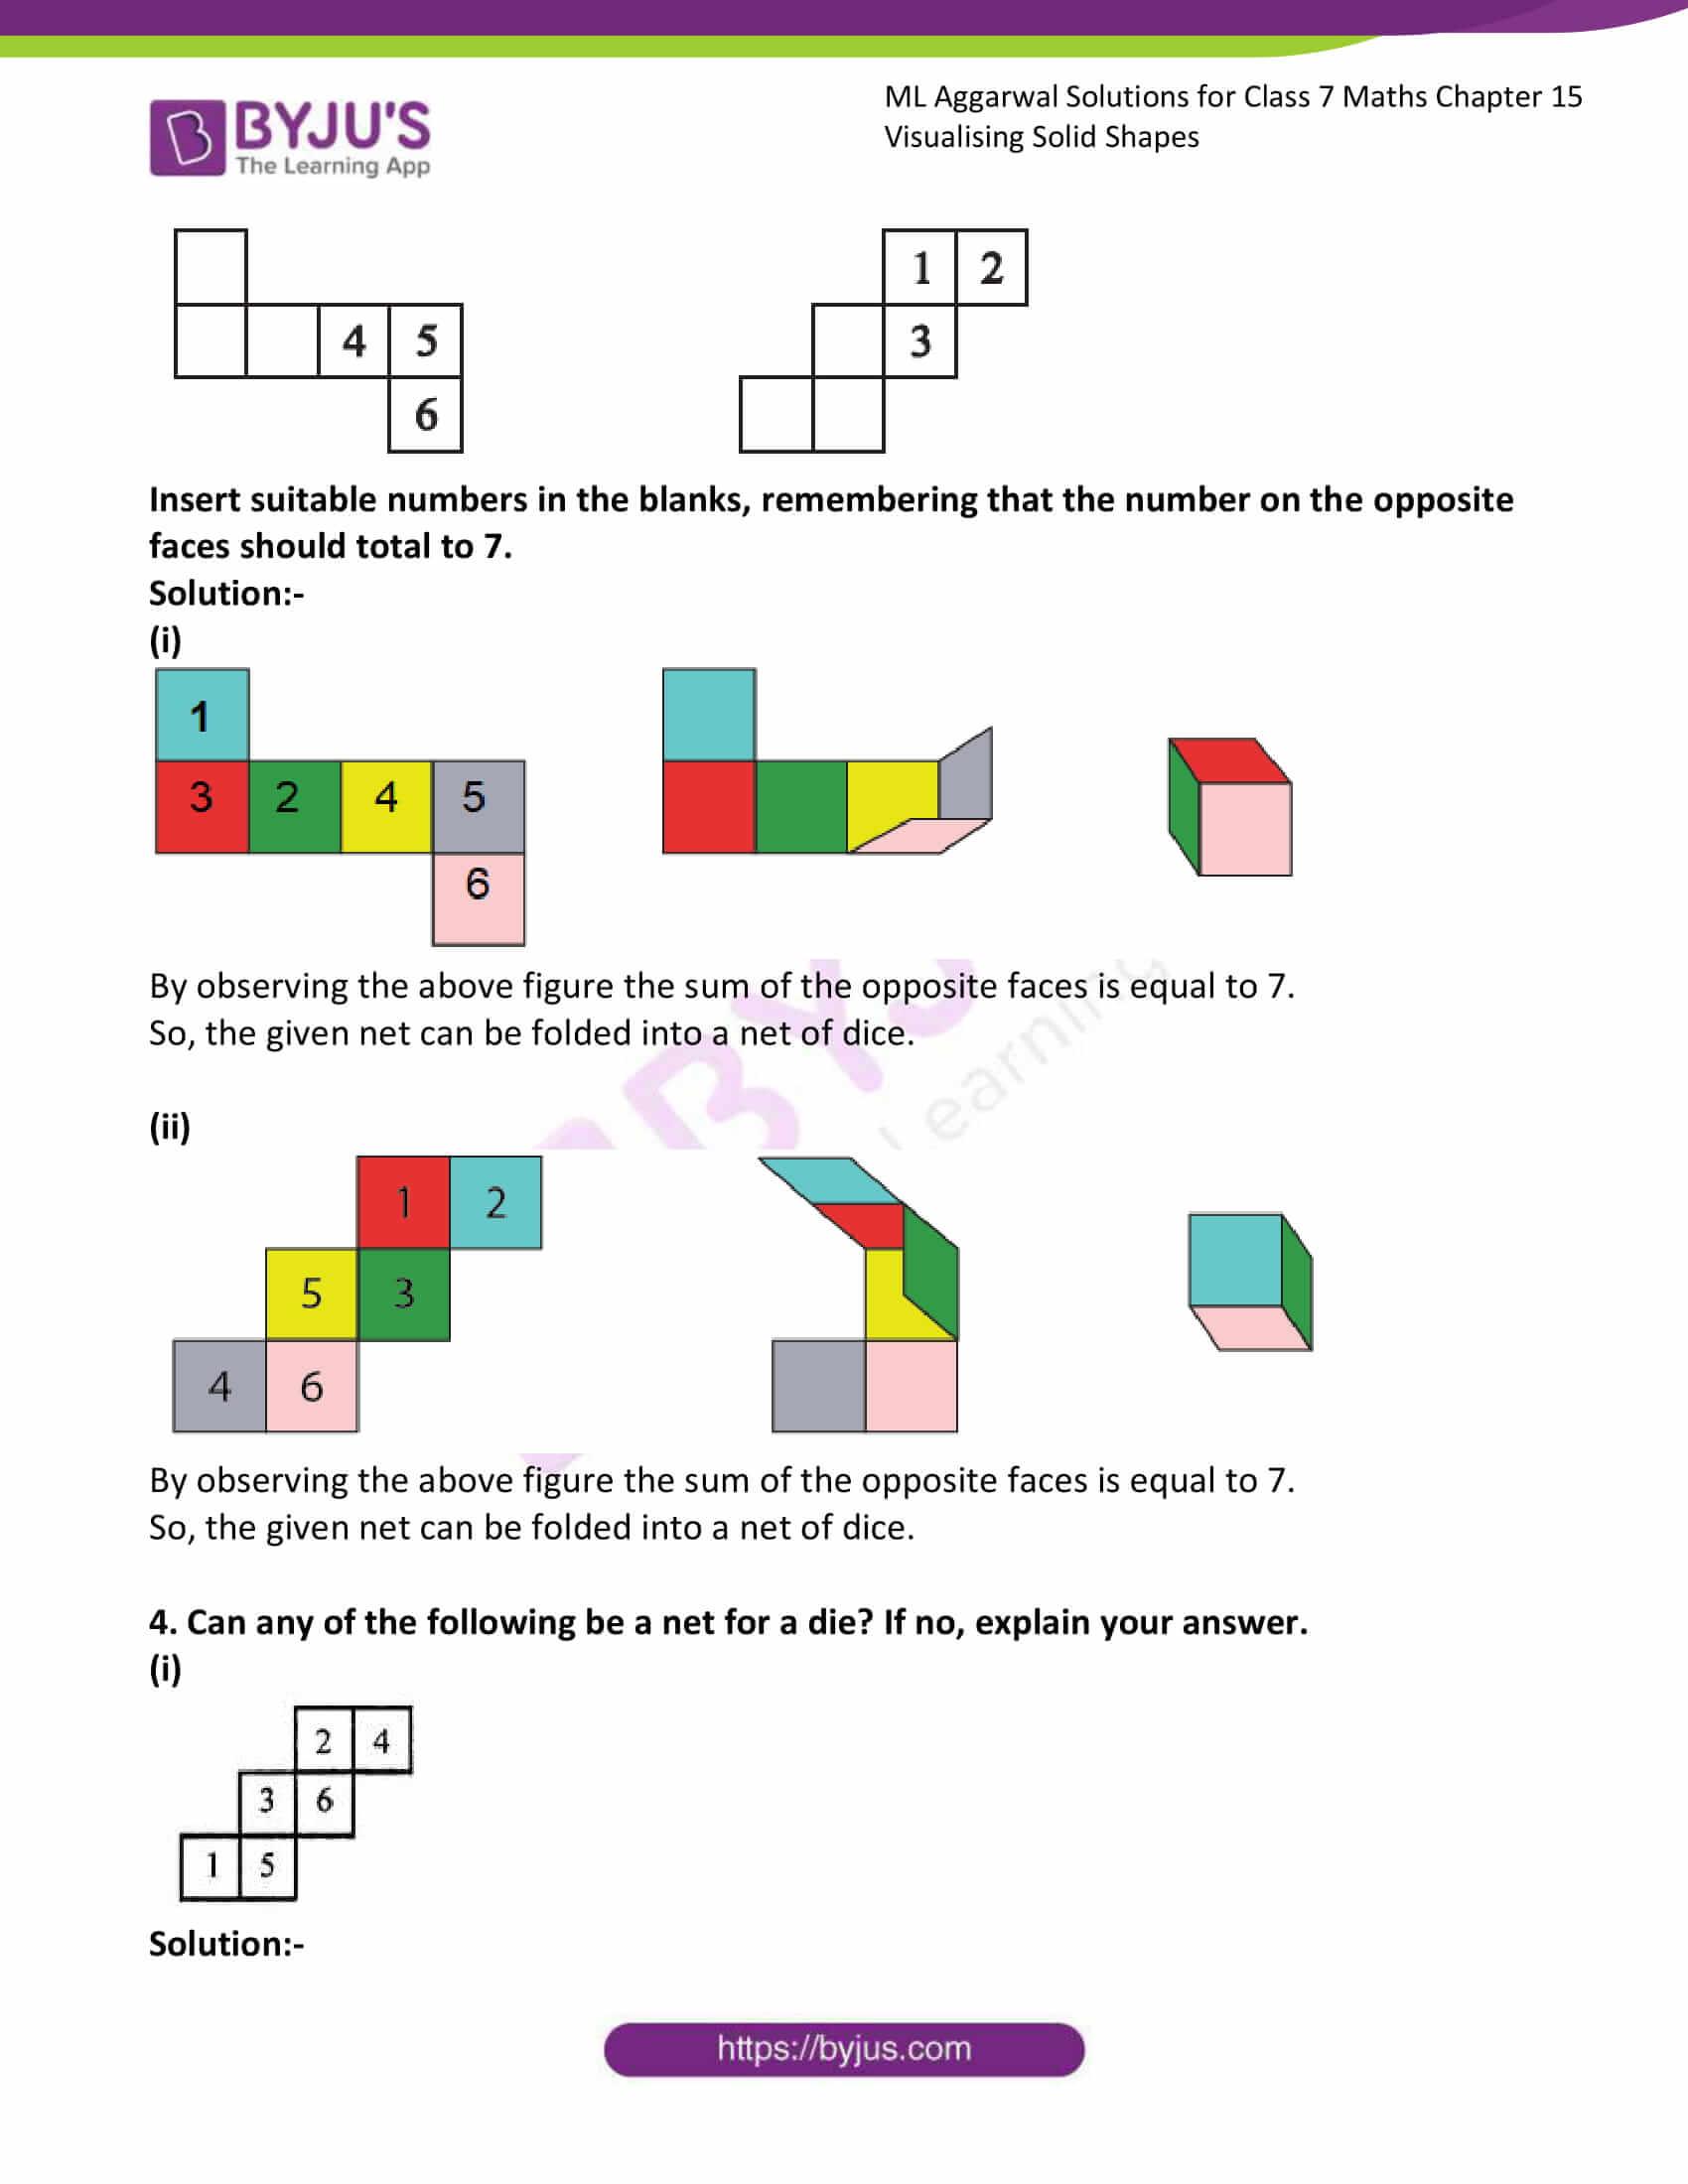 ml aggarwal sol class 7 maths chapter 15 6